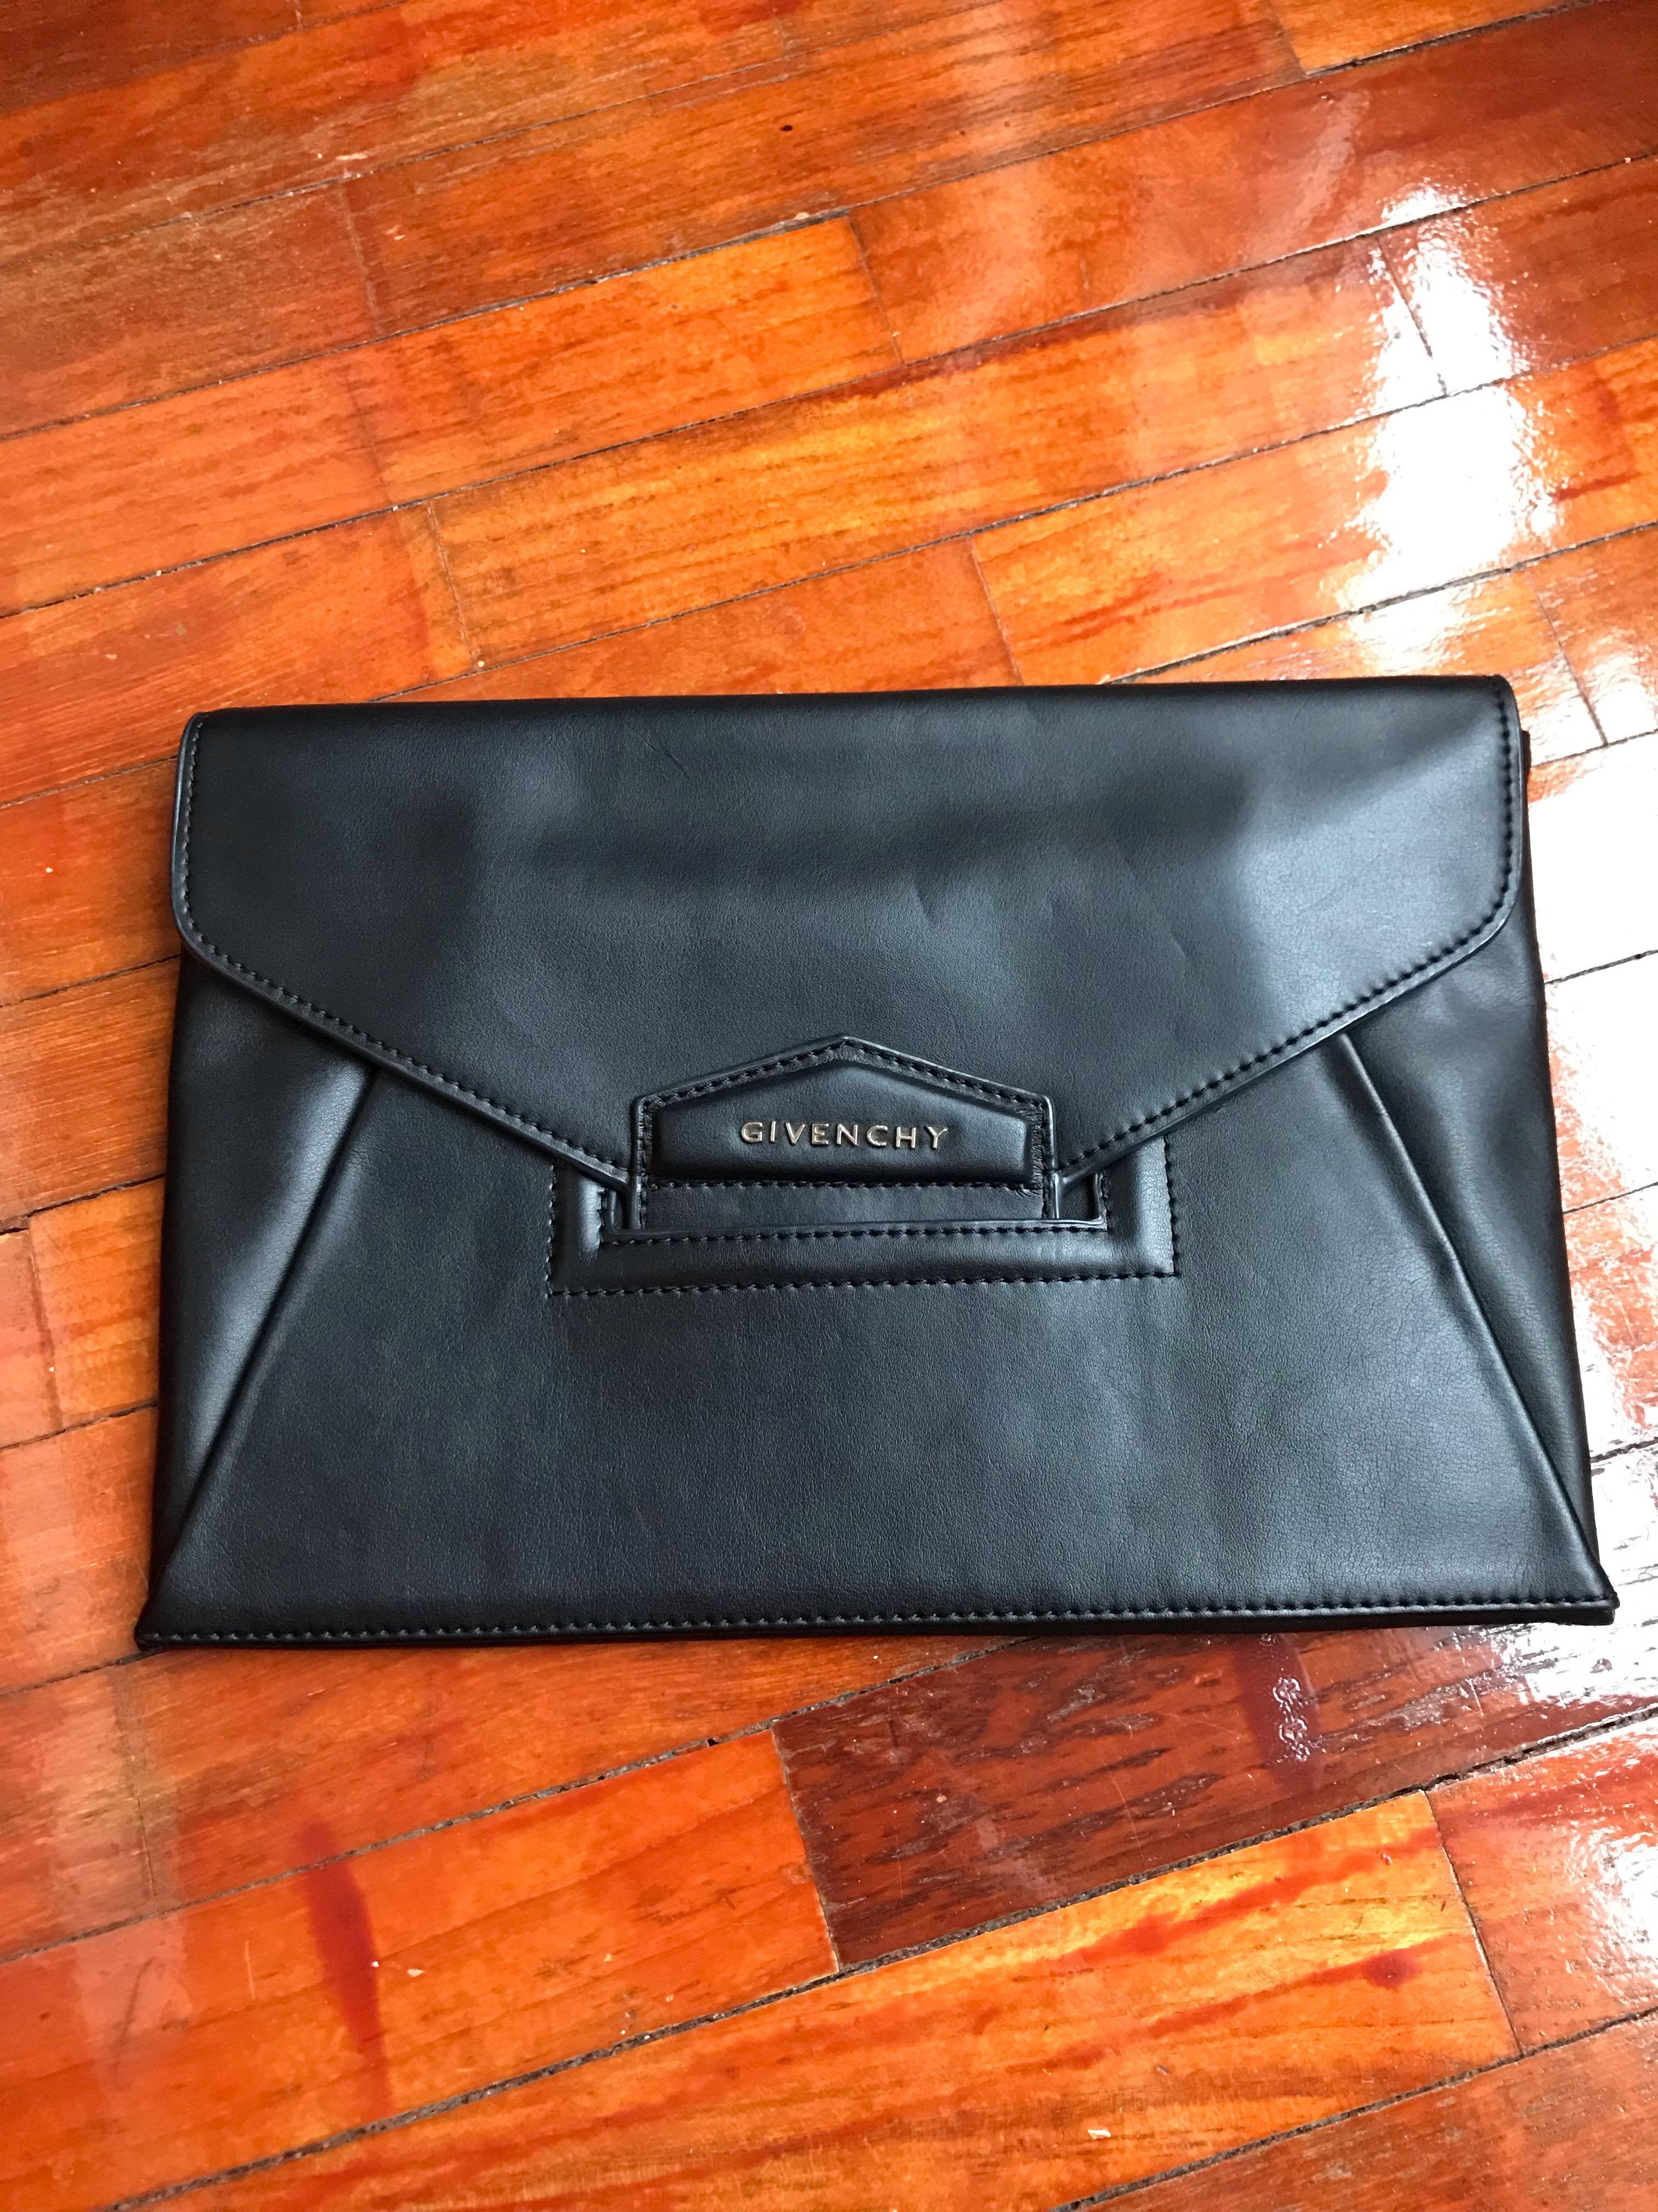 8ef91f2bb4 Givenchy Antigona clutch, Women's Fashion, Bags & Wallets, Clutches ...